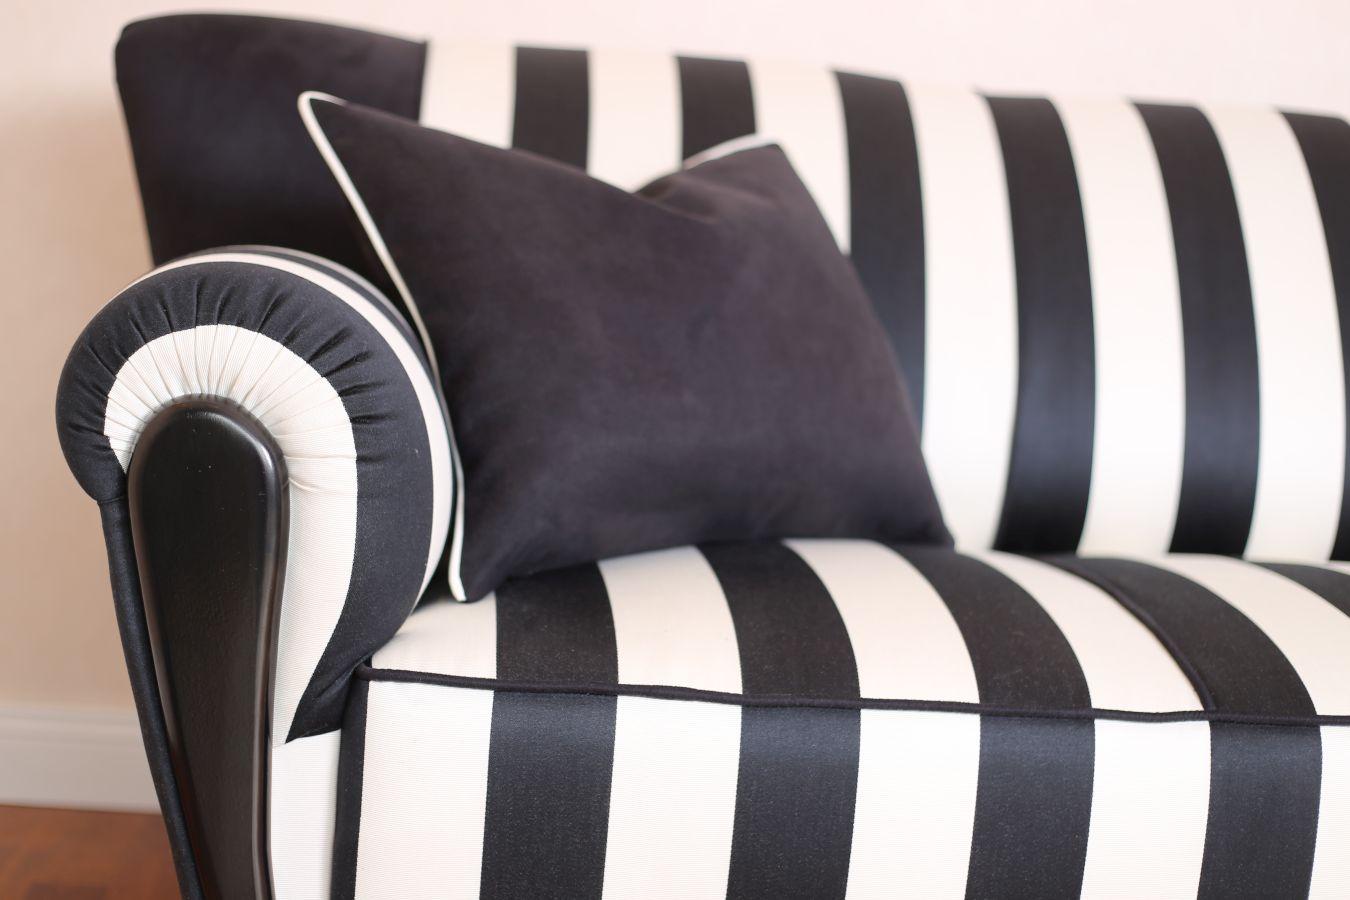 m belpolsterei bei bad honnef sitzpolster nach ma. Black Bedroom Furniture Sets. Home Design Ideas